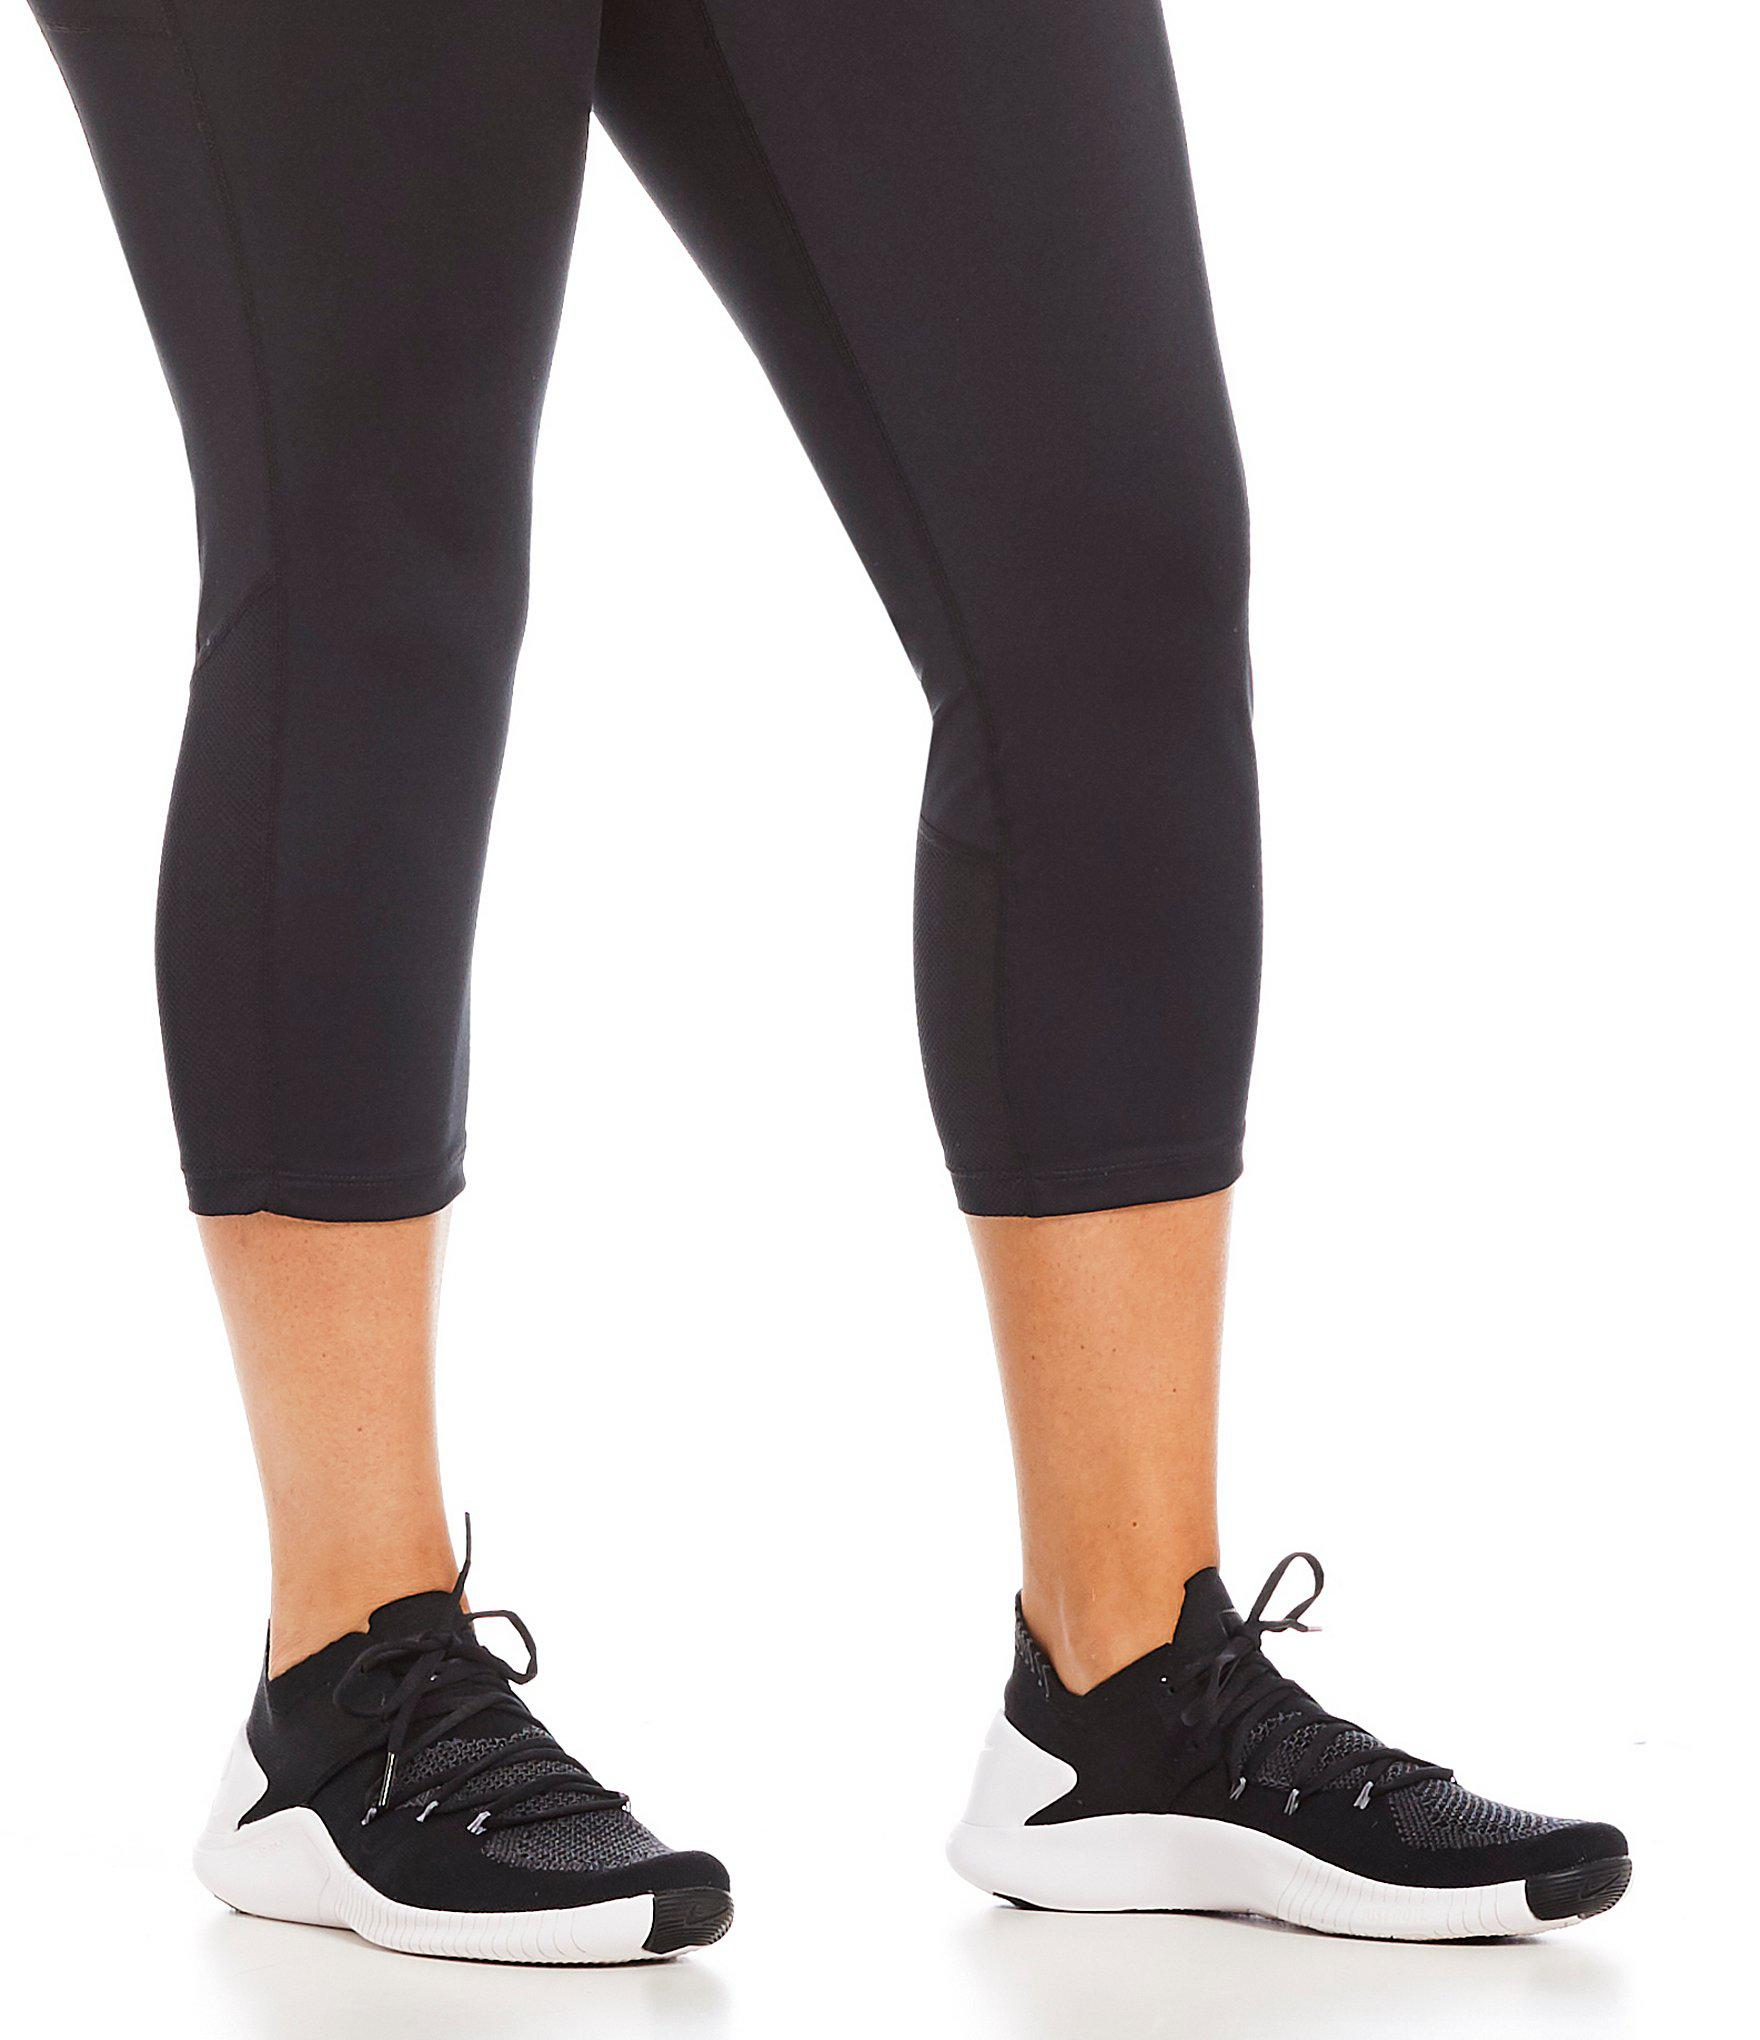 8c7a3bec2f73f3 Lyst - Nike Women s Free Tr Flyknit 3 Training Shoes in Black